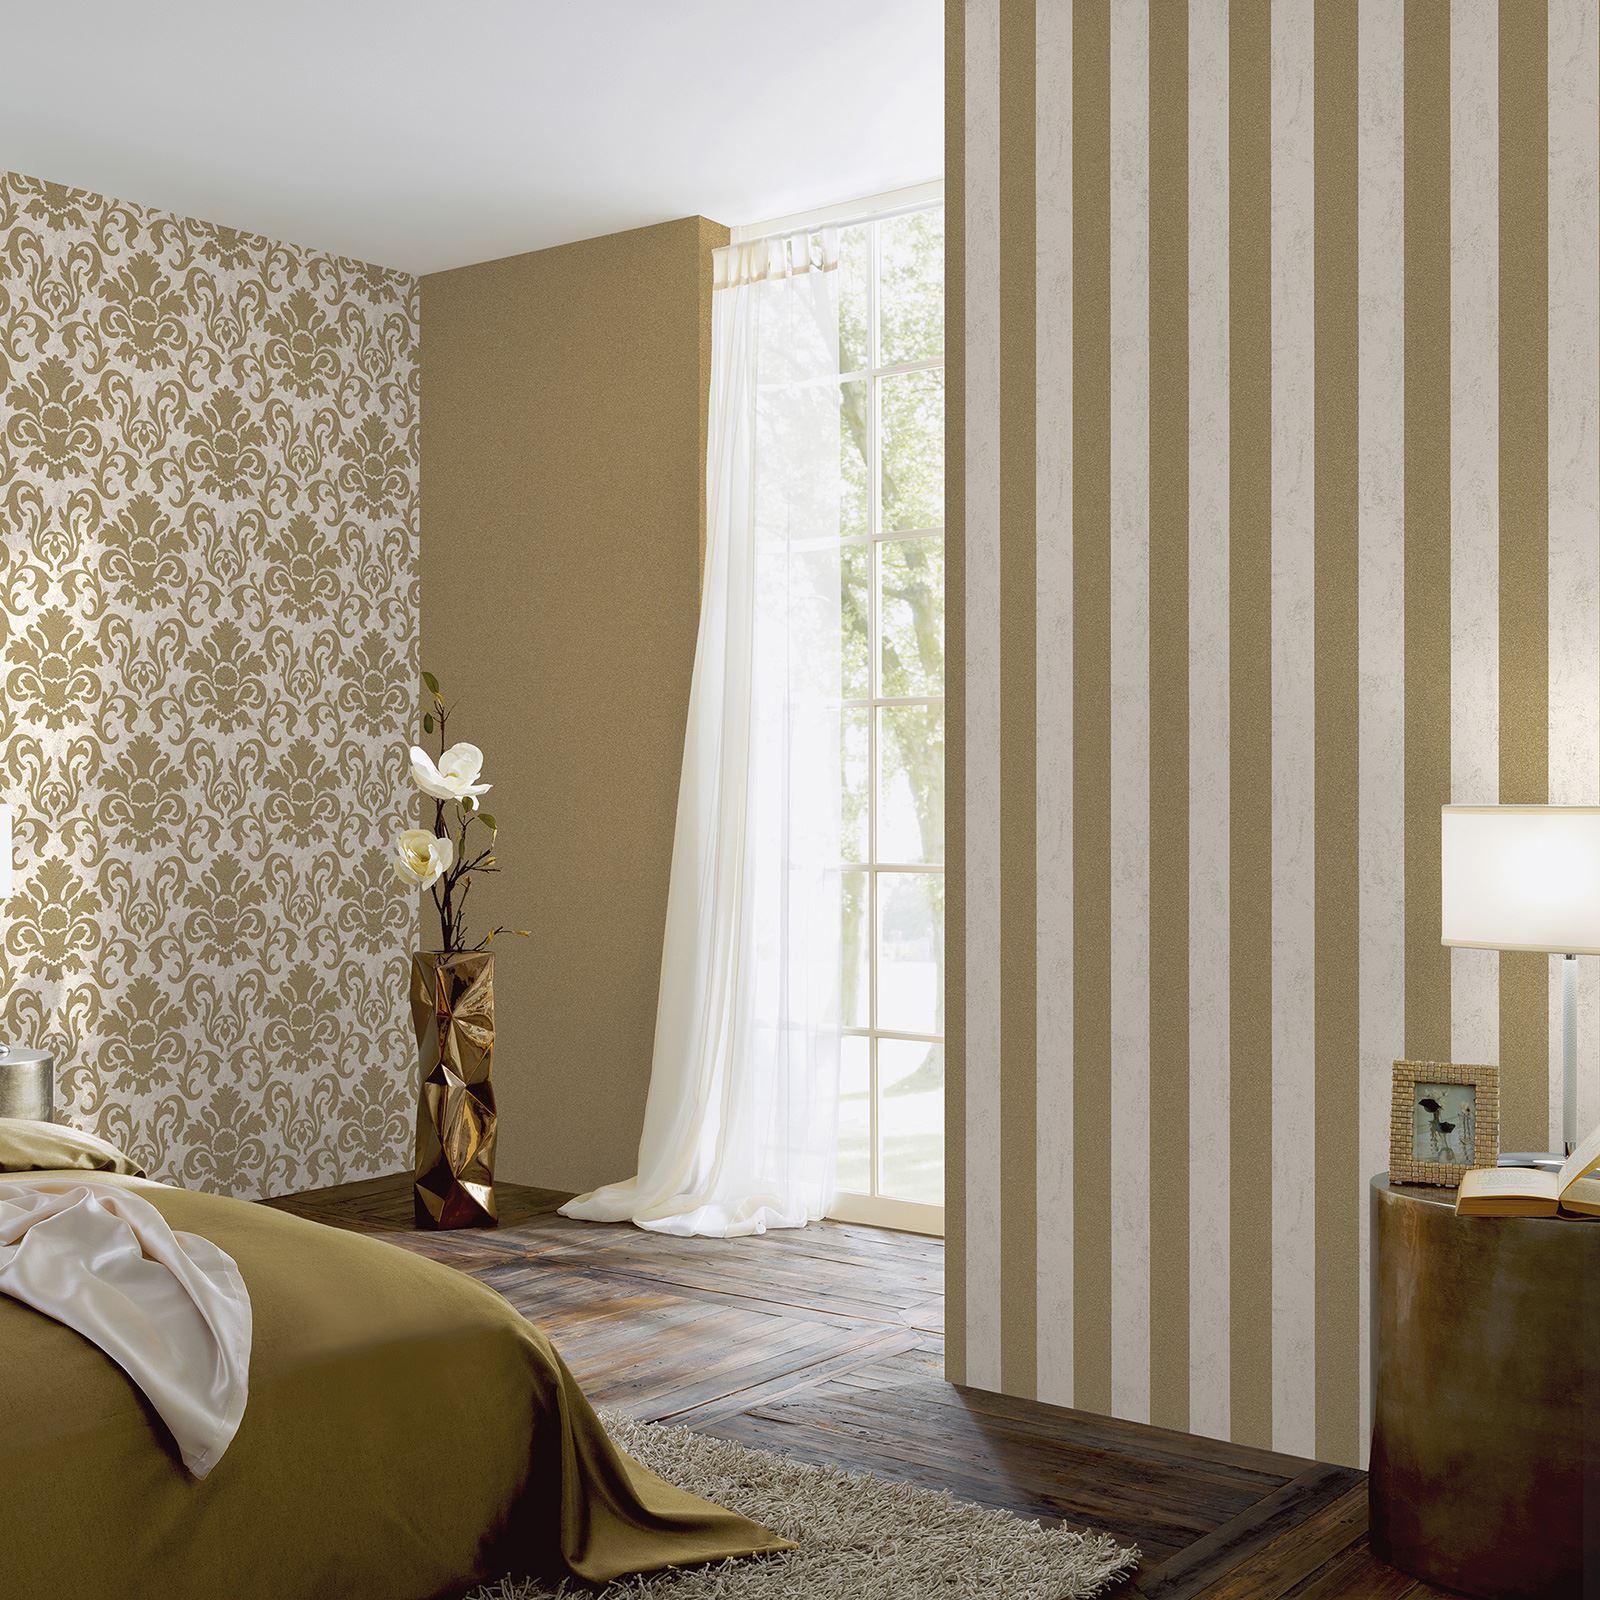 P s carat glitter stripe wallpaper black cream silver gold for Gold bedroom wallpaper